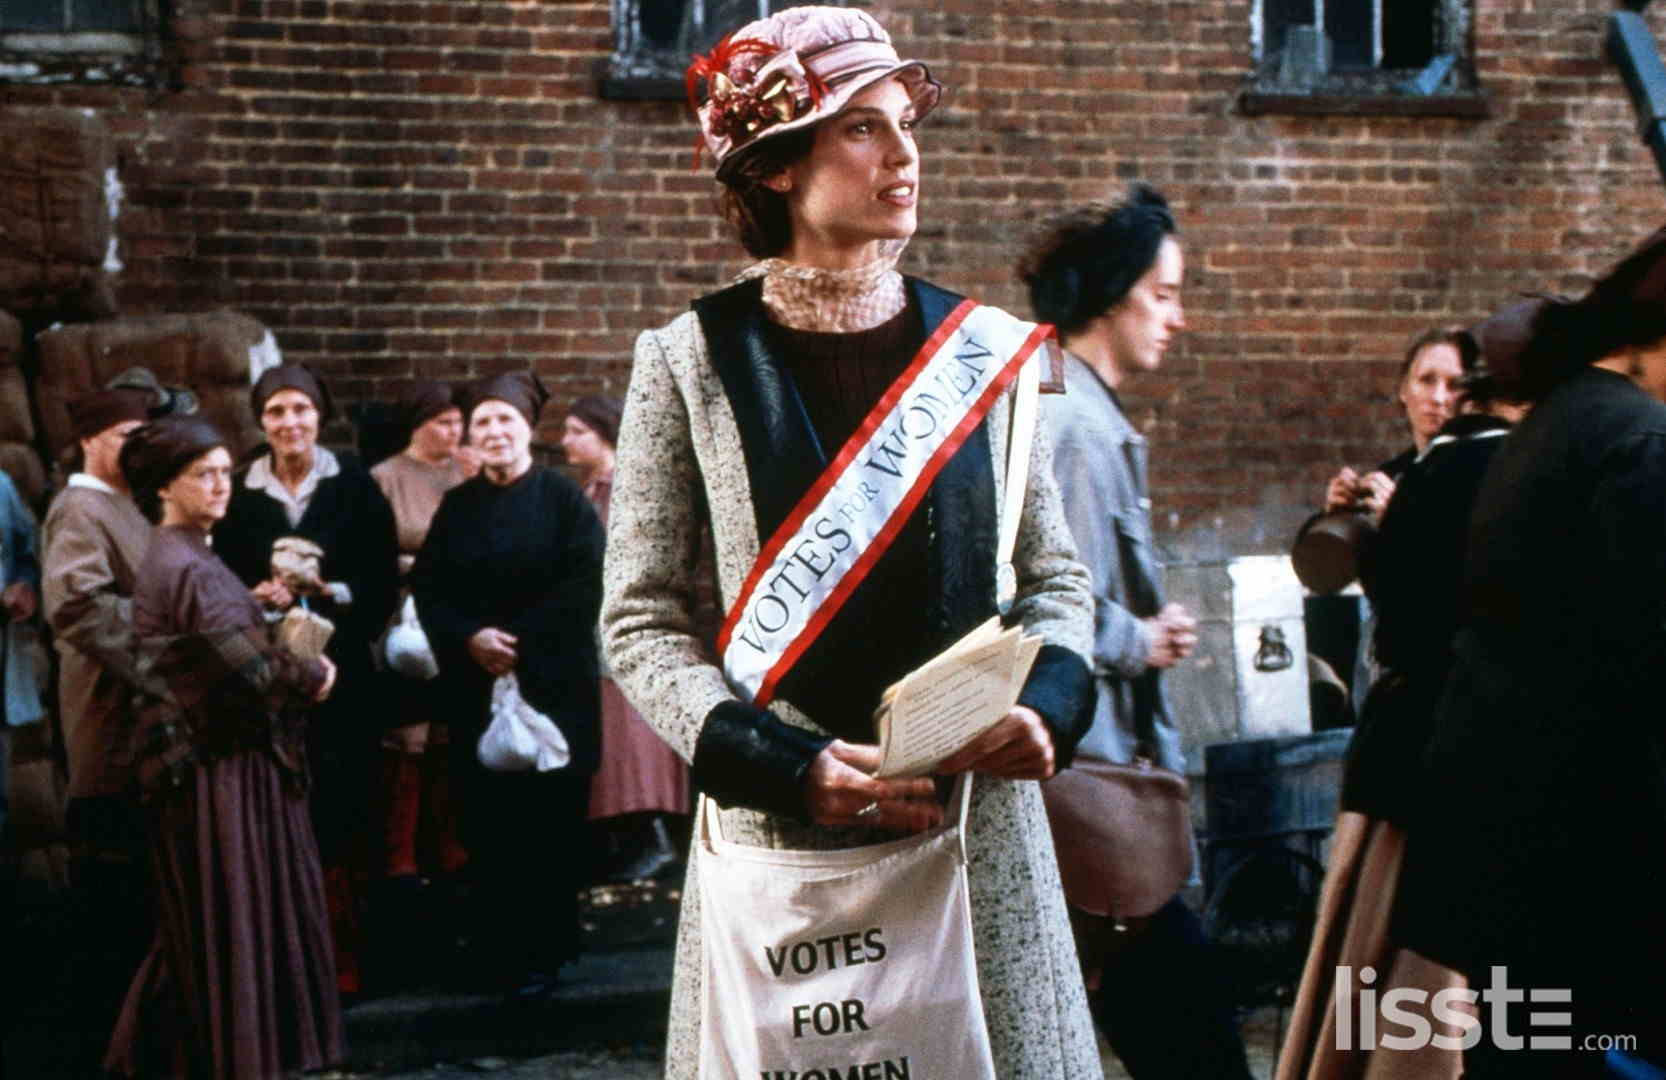 hbz-the-list-feminist-movies-iron-jawed-angels-shutterstock-1519916287-1566981032.jpg